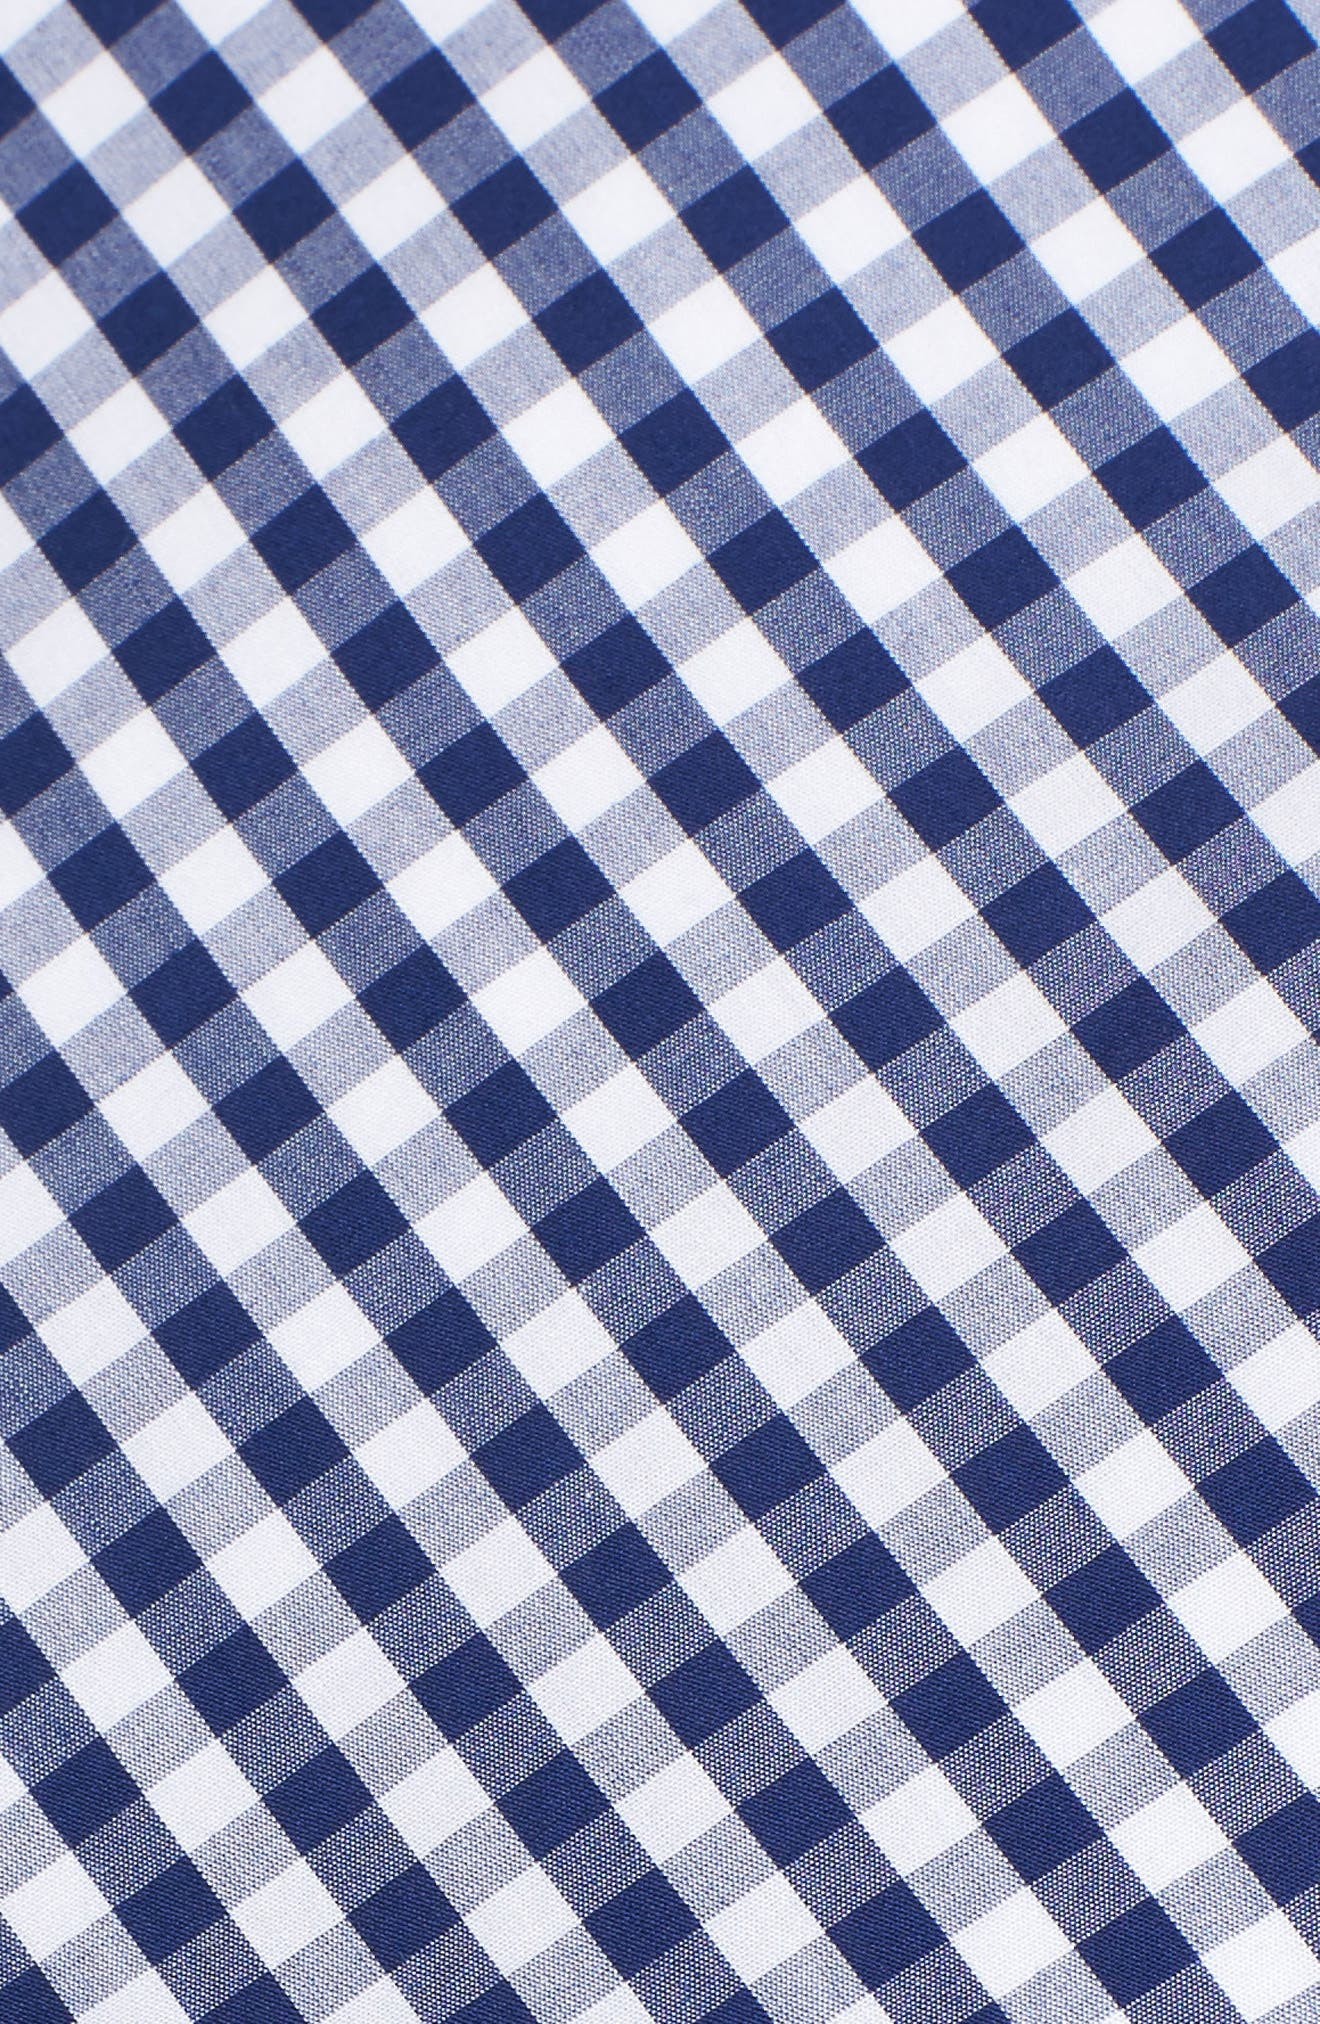 Cotton Gingham Midi Dress,                             Alternate thumbnail 5, color,                             400